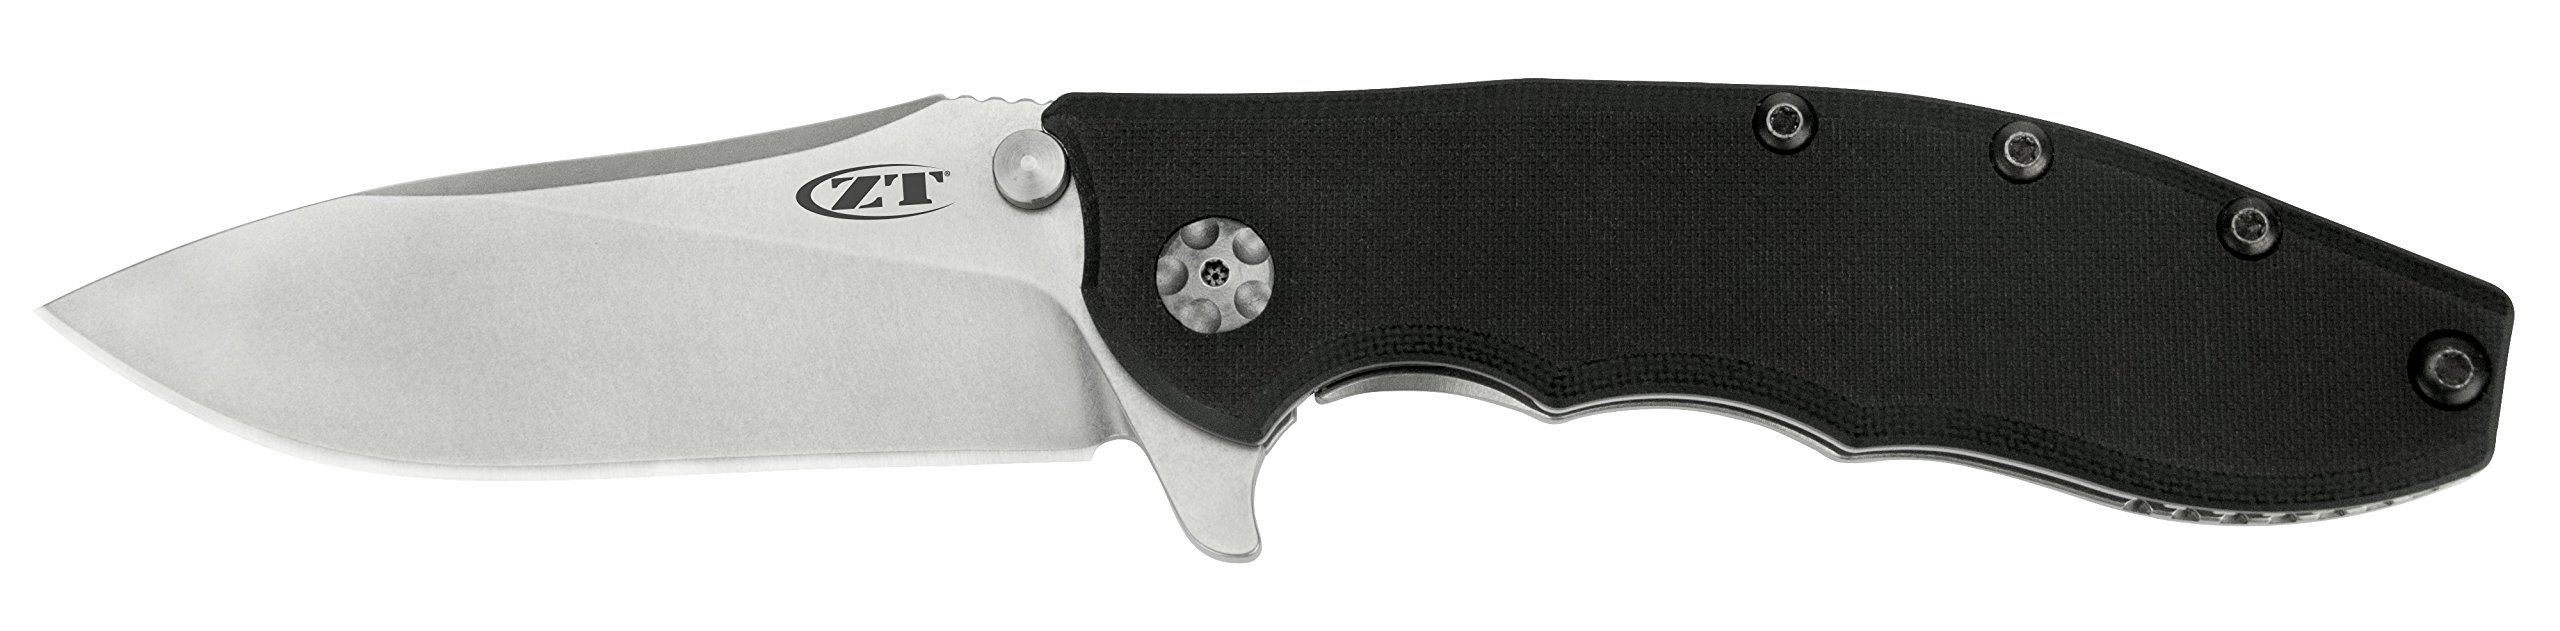 Zero Tolerance 0562 Hinderer Slicer Knife